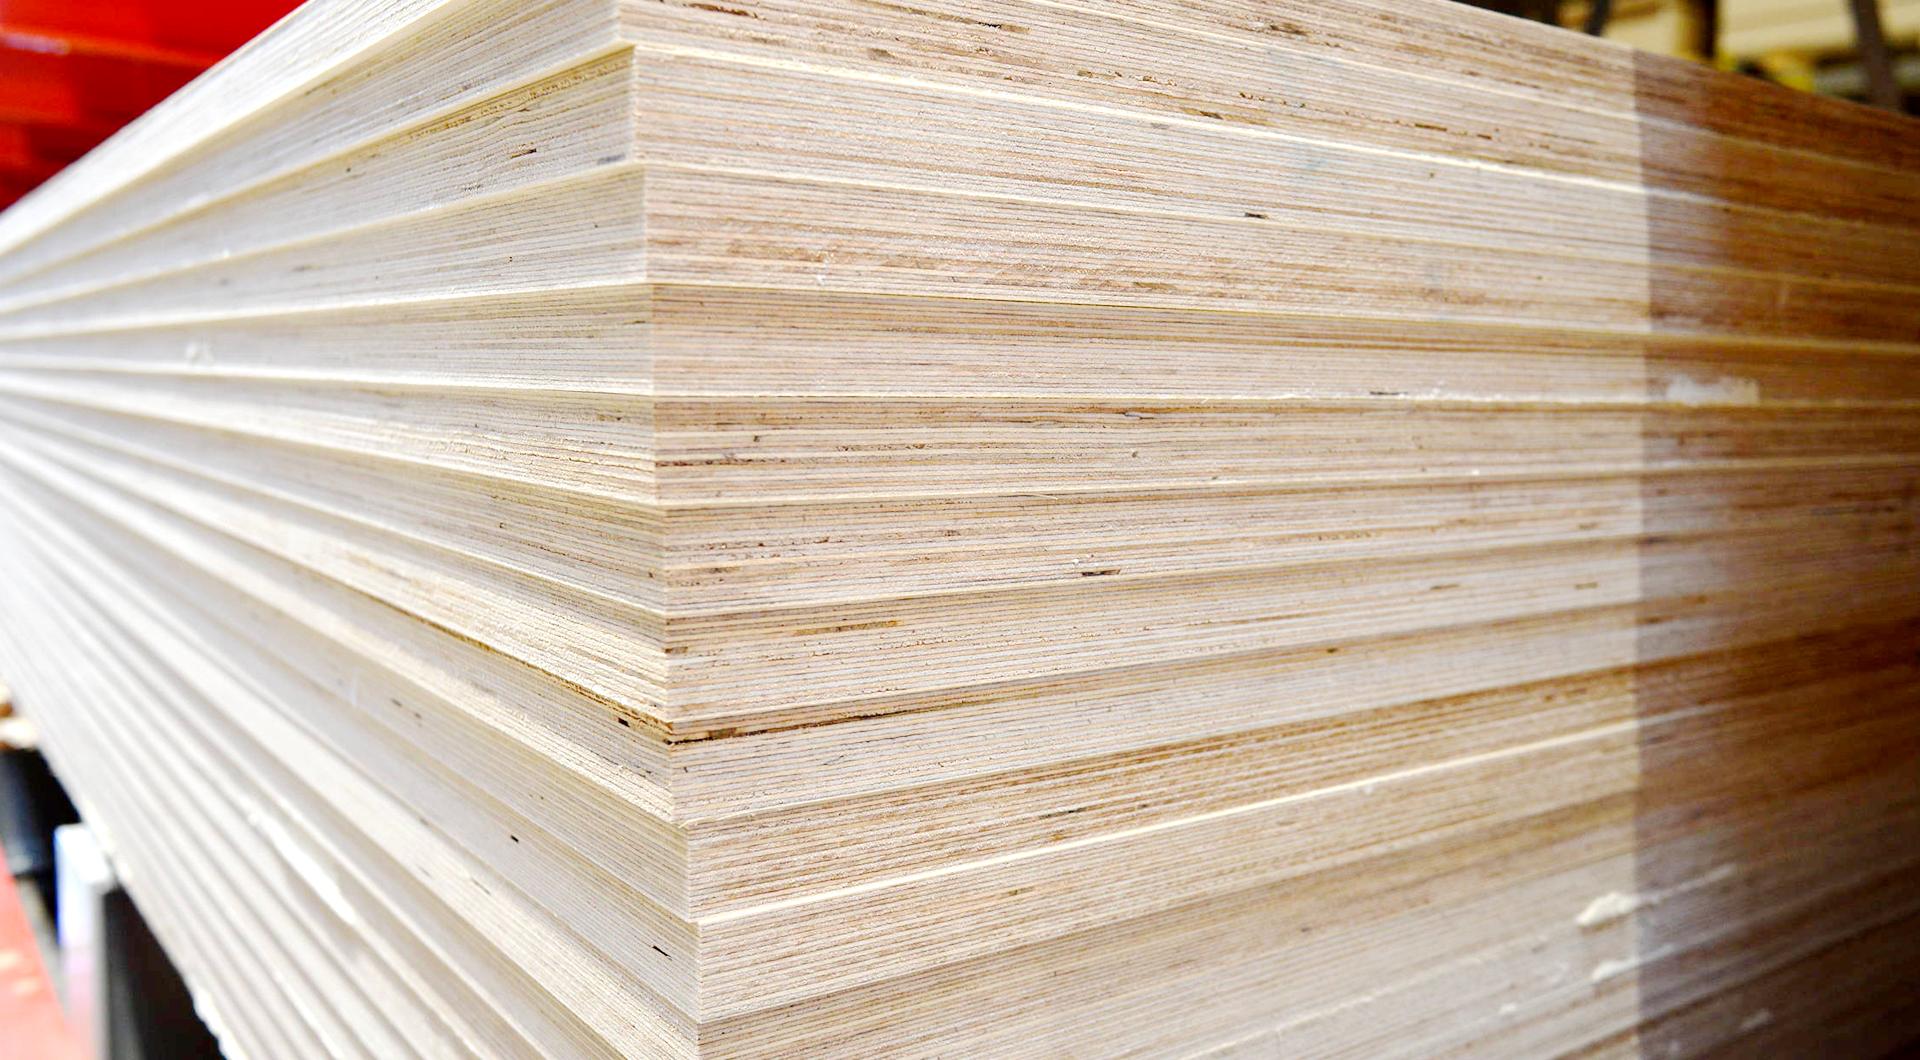 sperrholzplatten holz roeren in krefeld hat die passenden. Black Bedroom Furniture Sets. Home Design Ideas